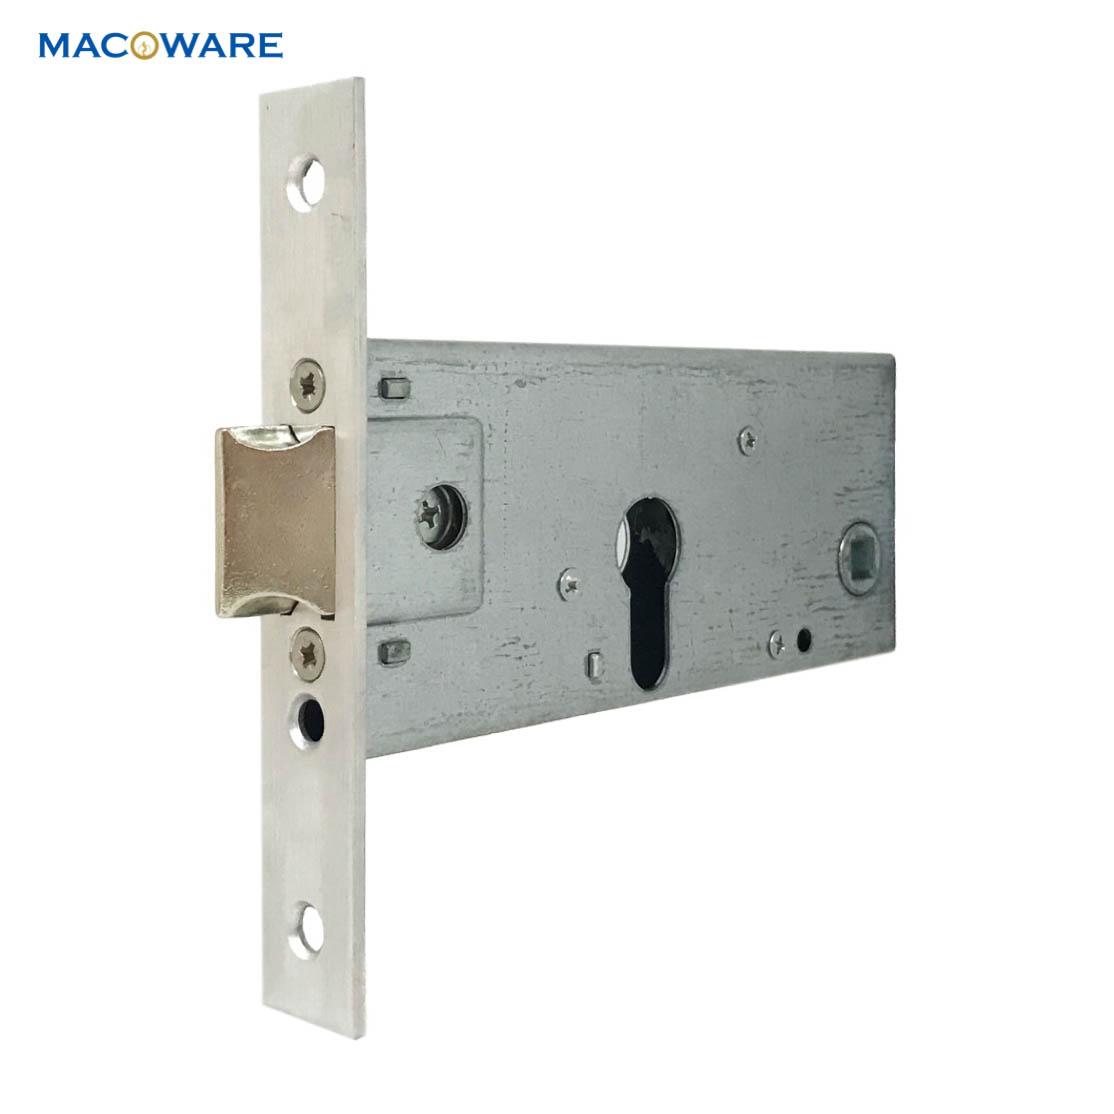 43_Small T type latch lock_1